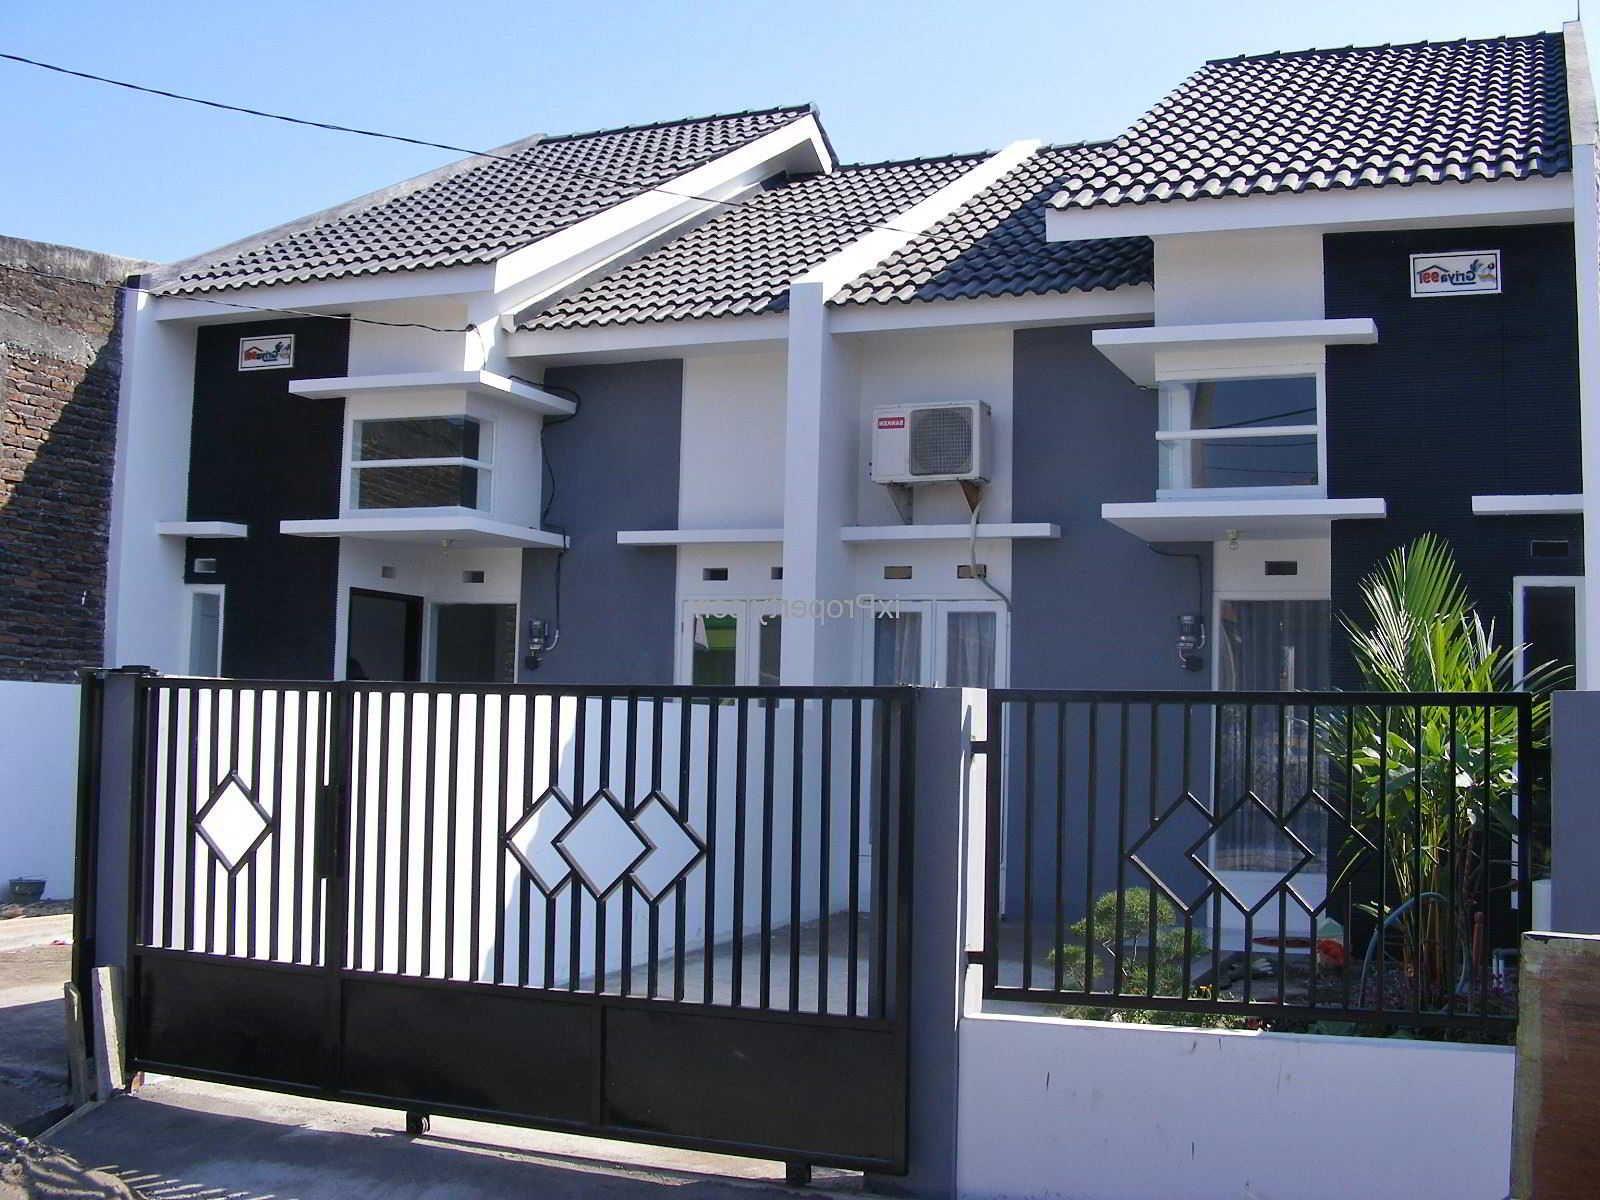 60 Desain Pintu Pagar Rumah Minimalis Modern Ideas Fence Design Gate Design House Fence Design